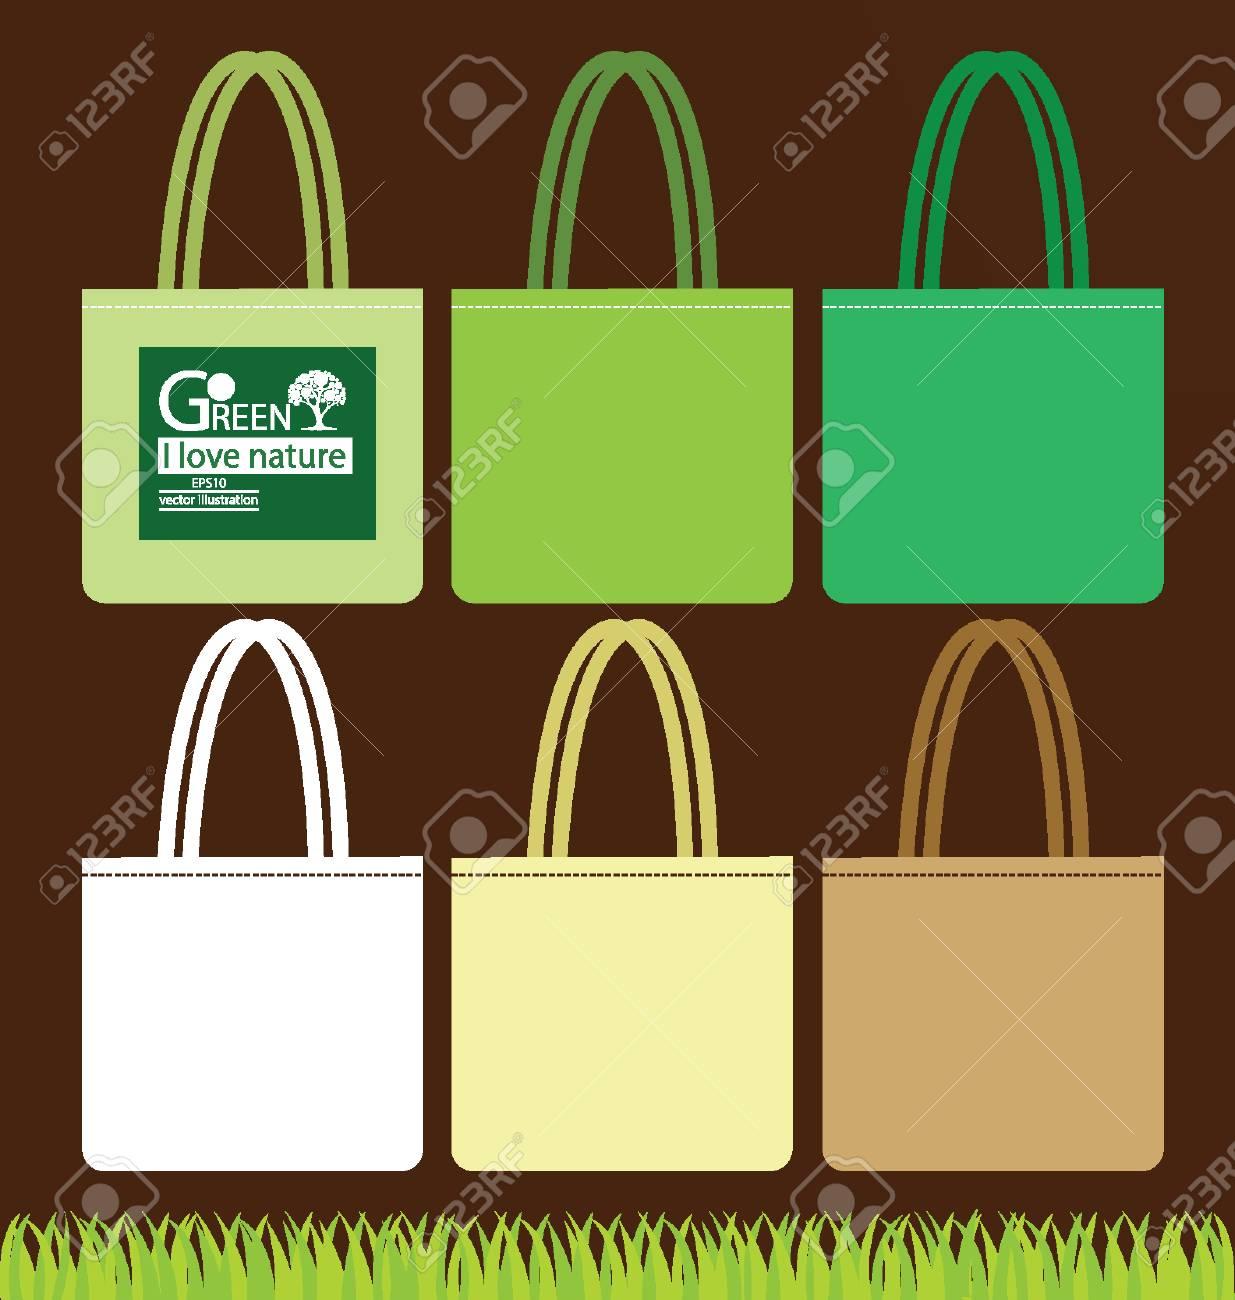 Bags, Go green concept vector illustration Stock Vector - 24924495